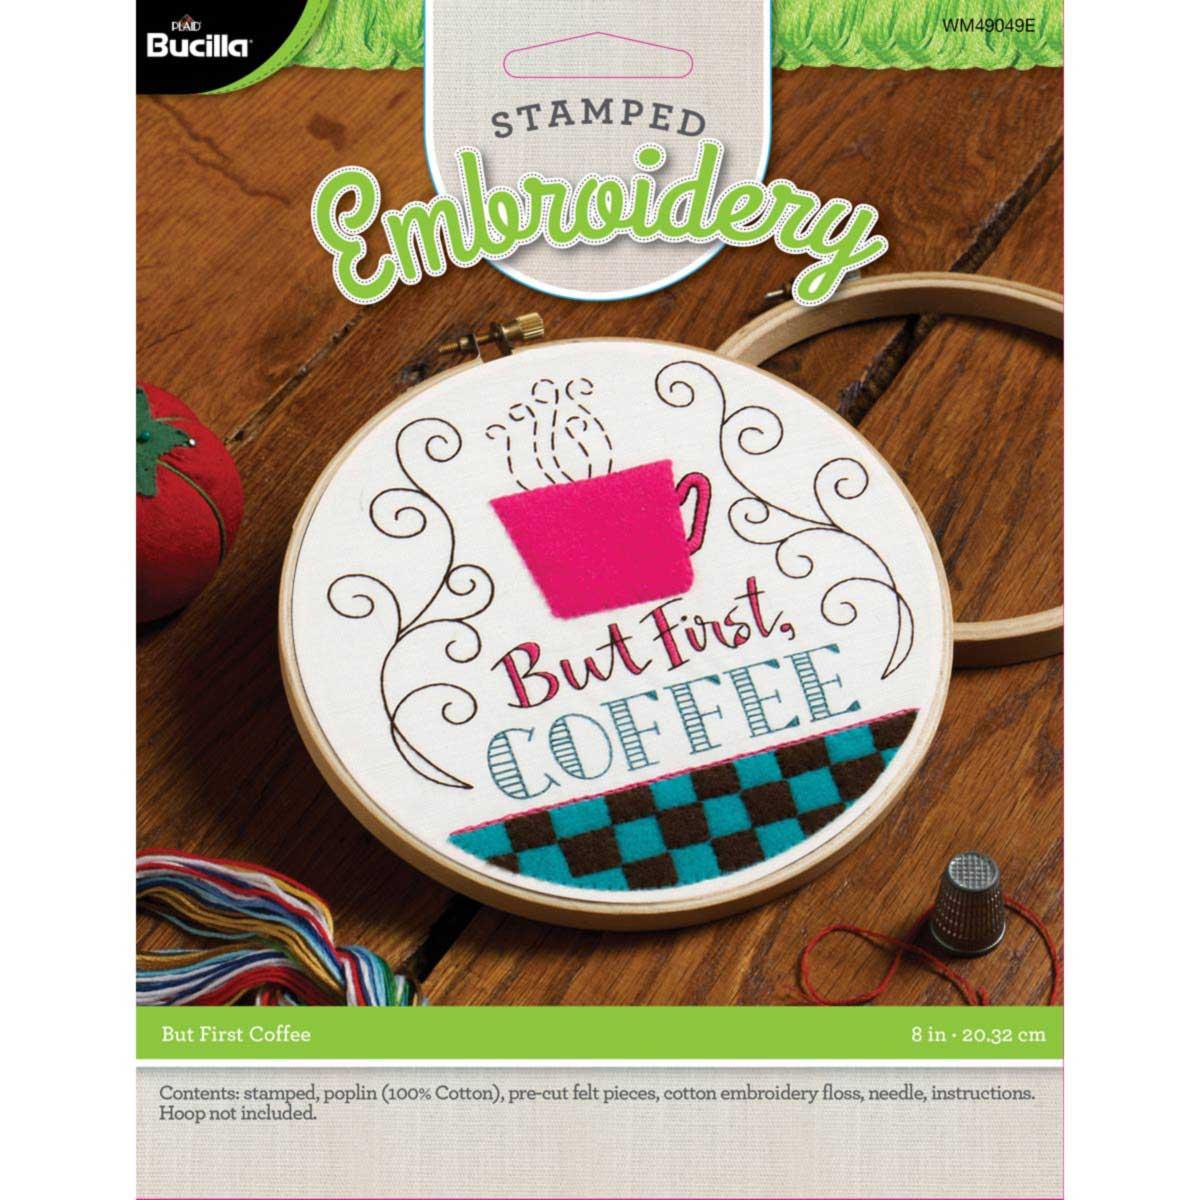 Bucilla ® My 1st Stitch™ - Stamped Cross Stitch Kits - But First Coffee